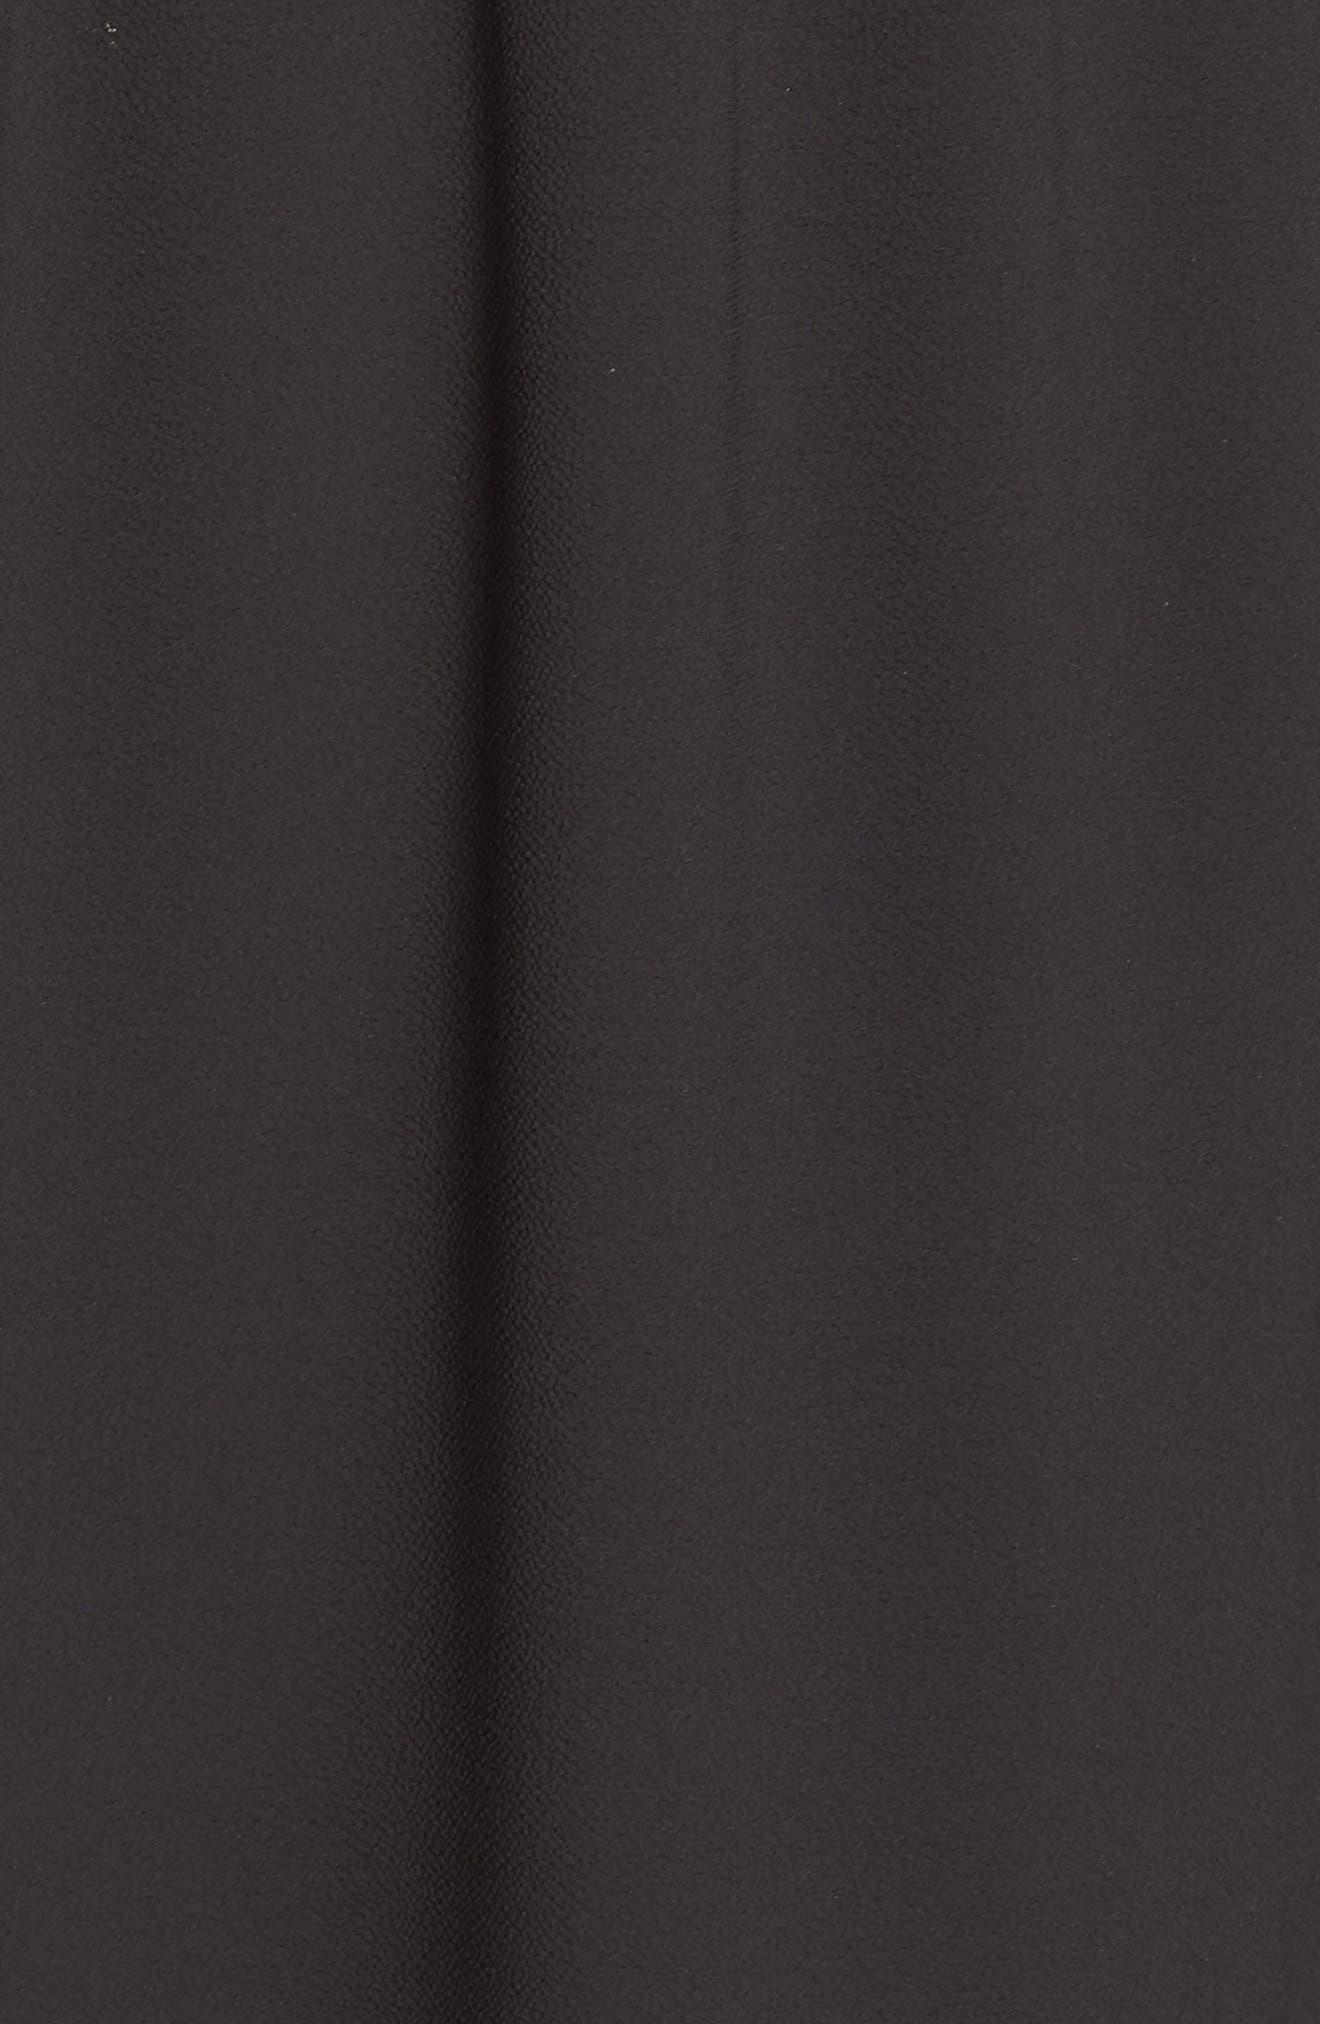 ,                             x Hi Sugarplum! Palm Springs Festival Maxi Dress,                             Alternate thumbnail 6, color,                             BLACK